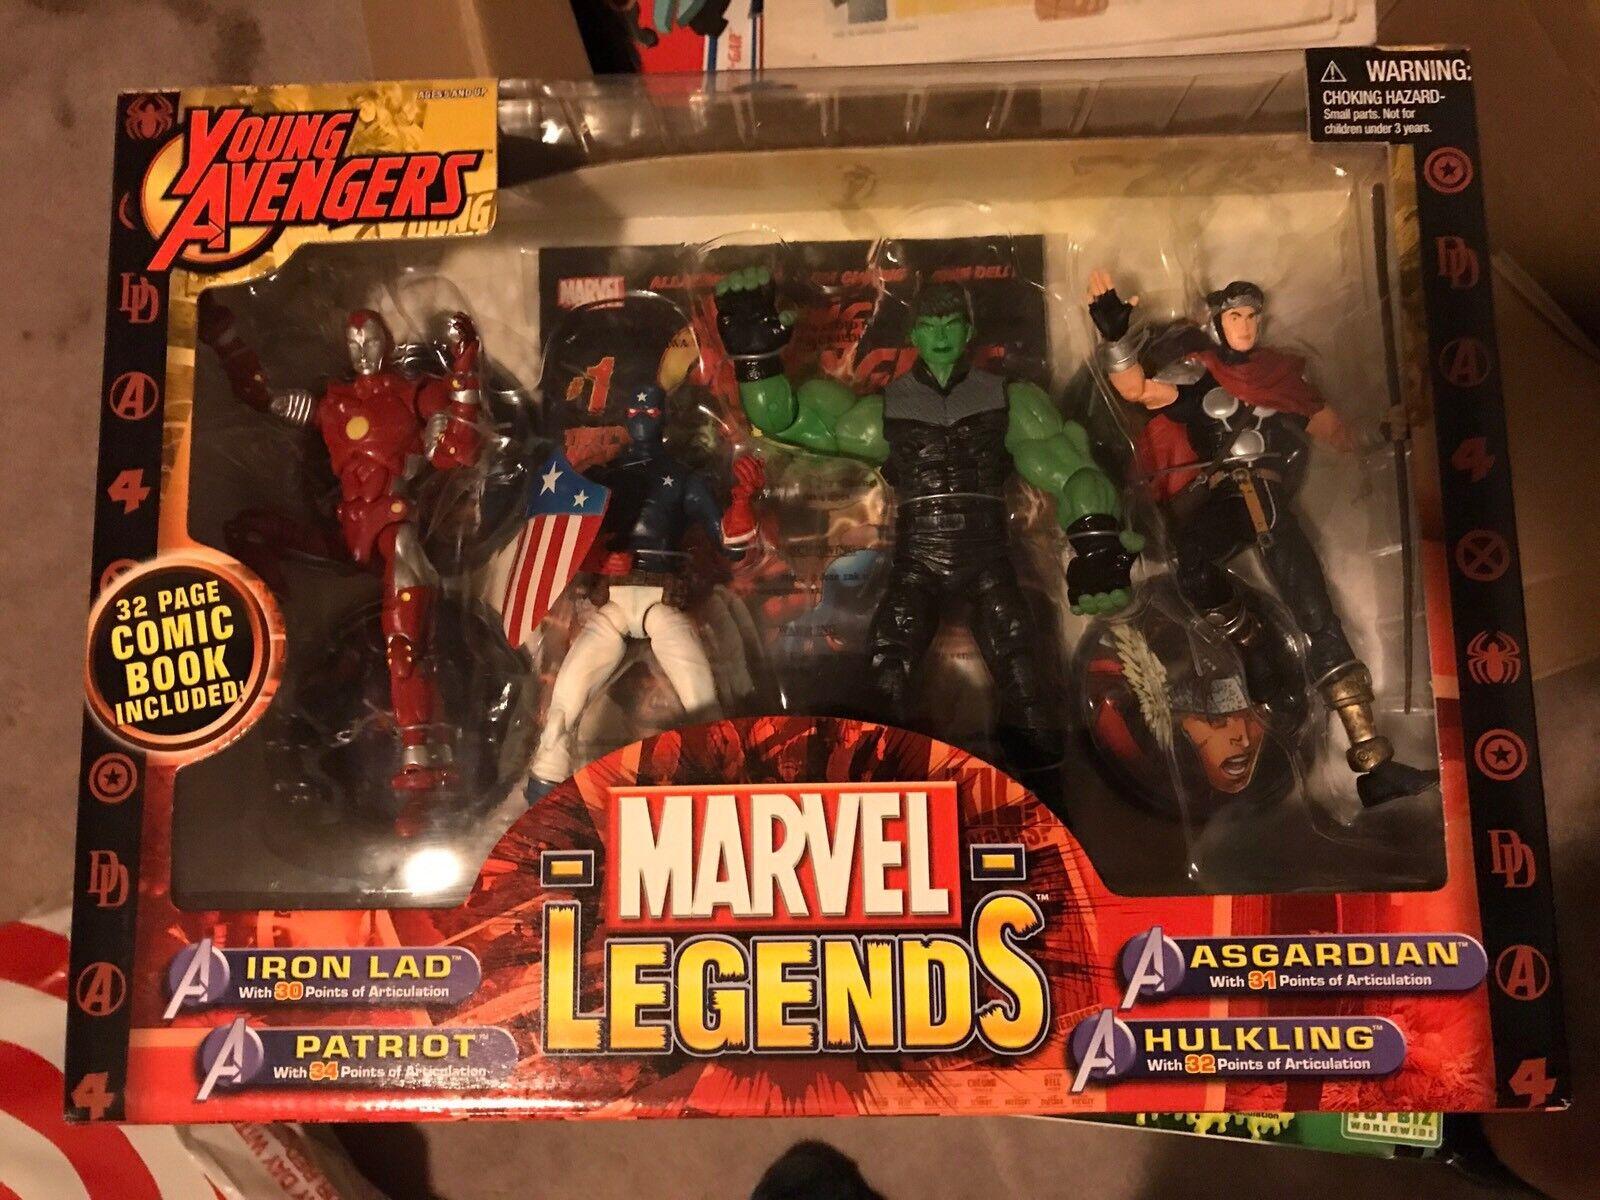 Marvel Legends Young Avengers  Set Iron Lad, Patriot, Asgardian, Hulkling, MISB  Commandez maintenant